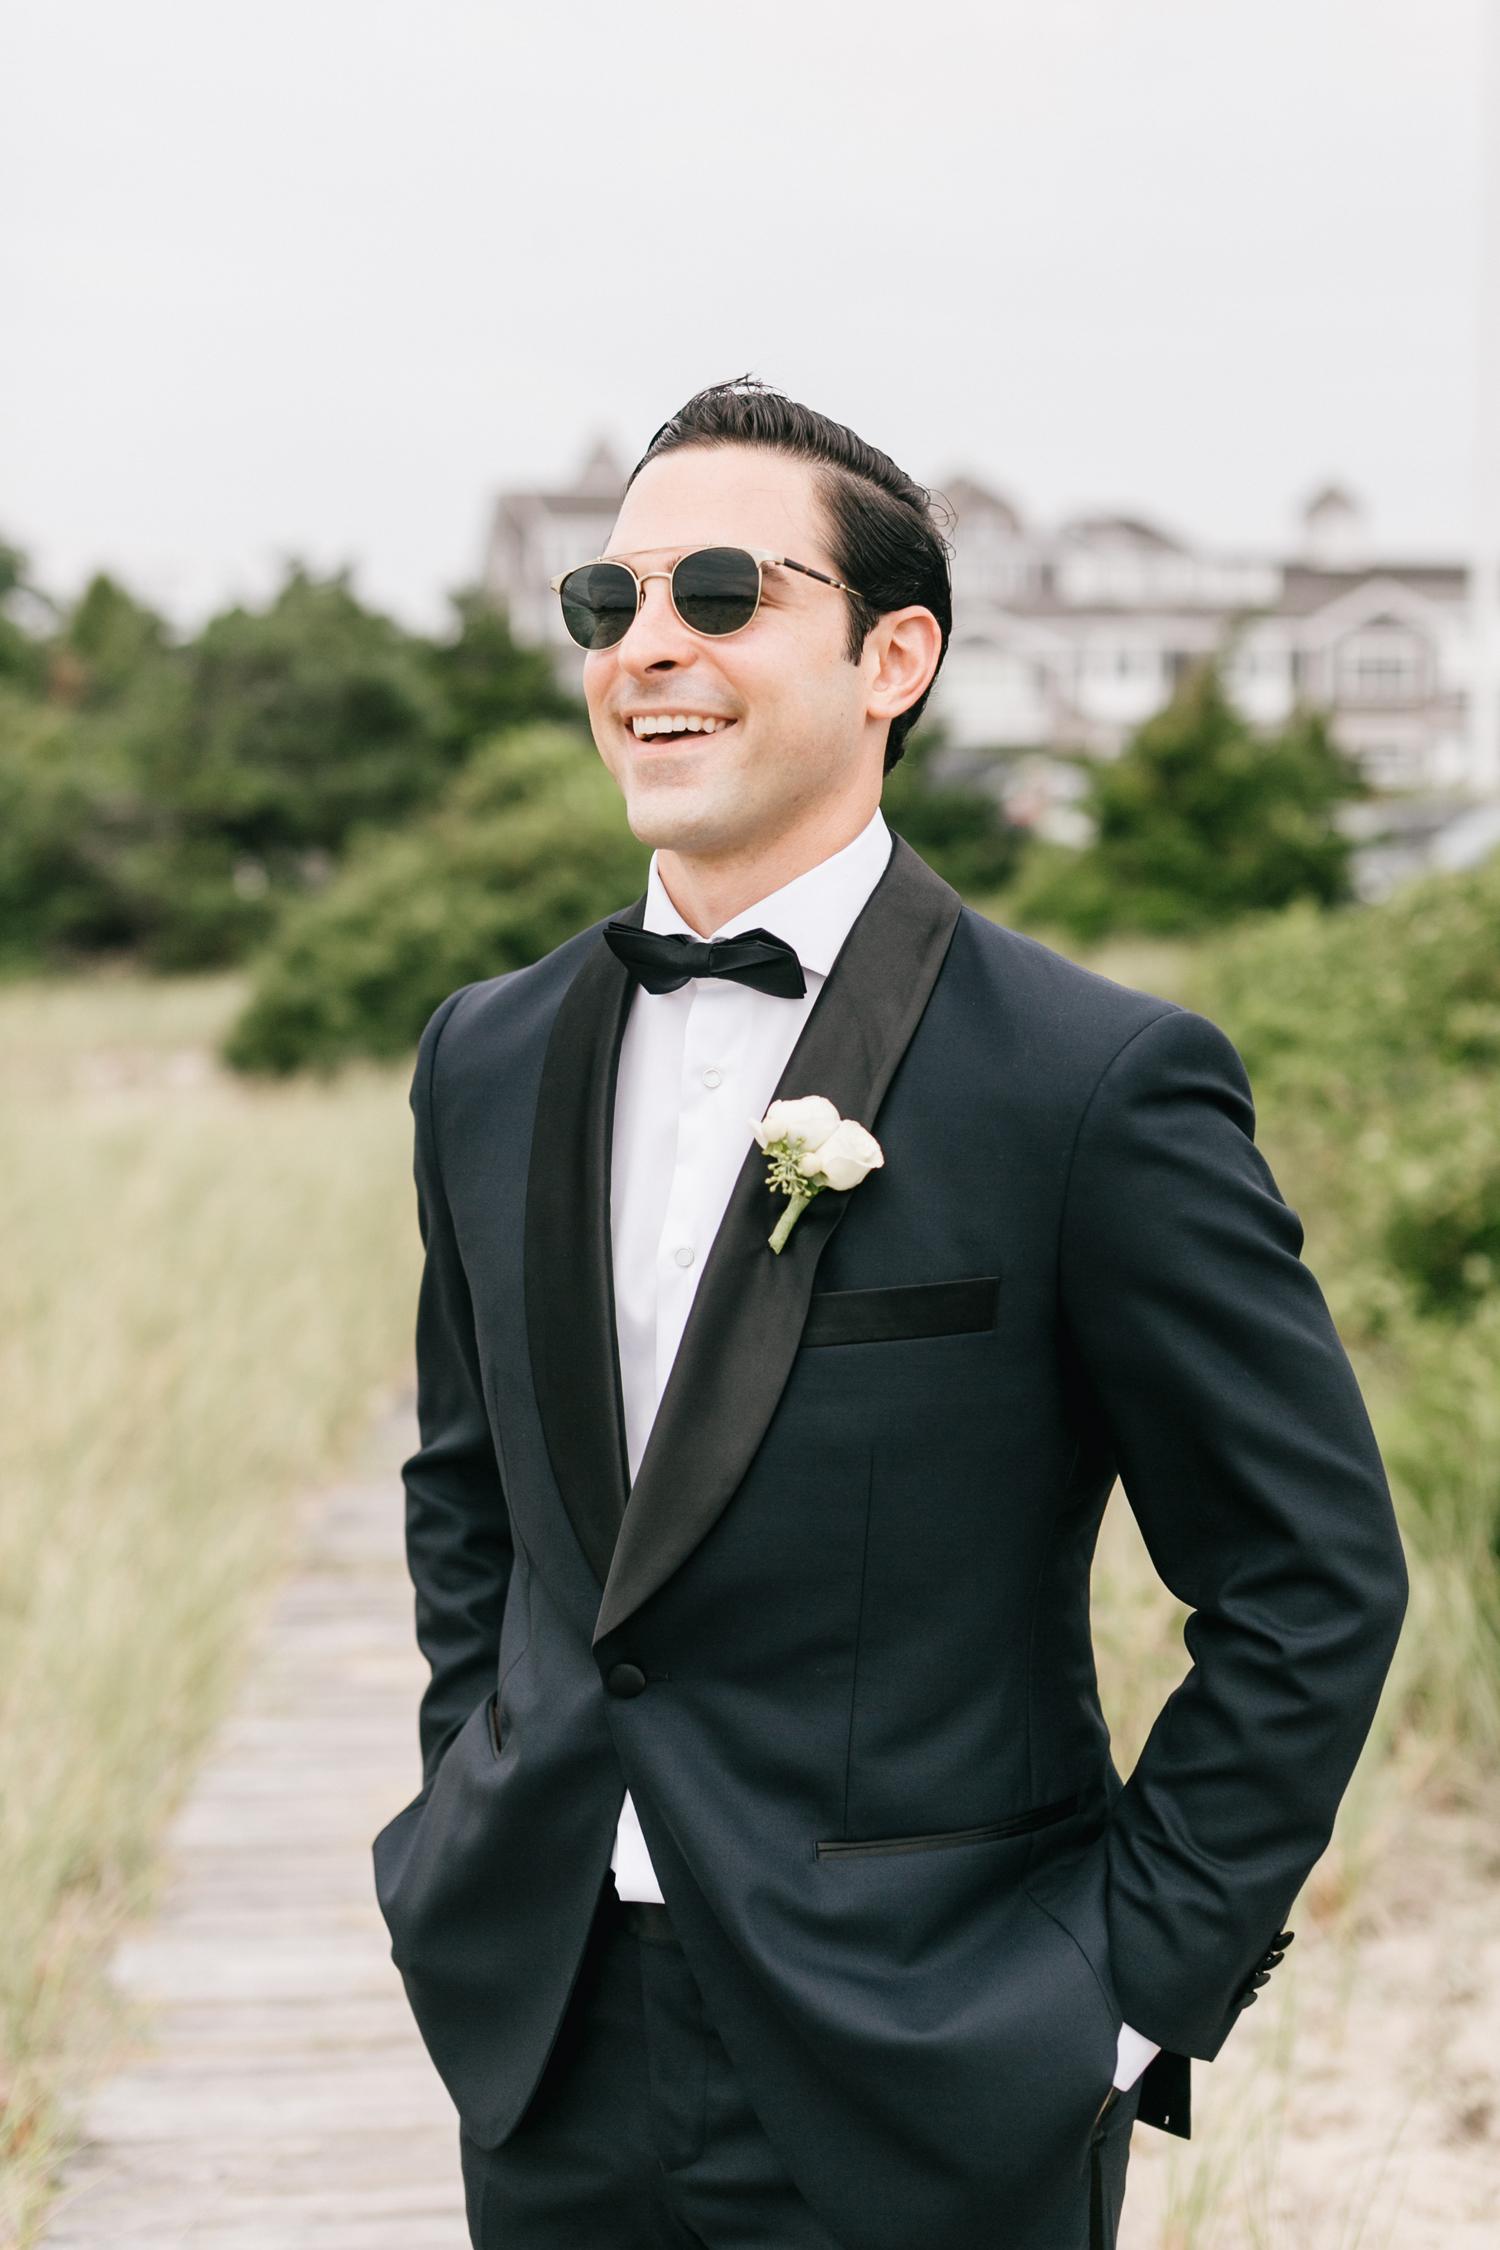 groom wearing sunglasses smiling